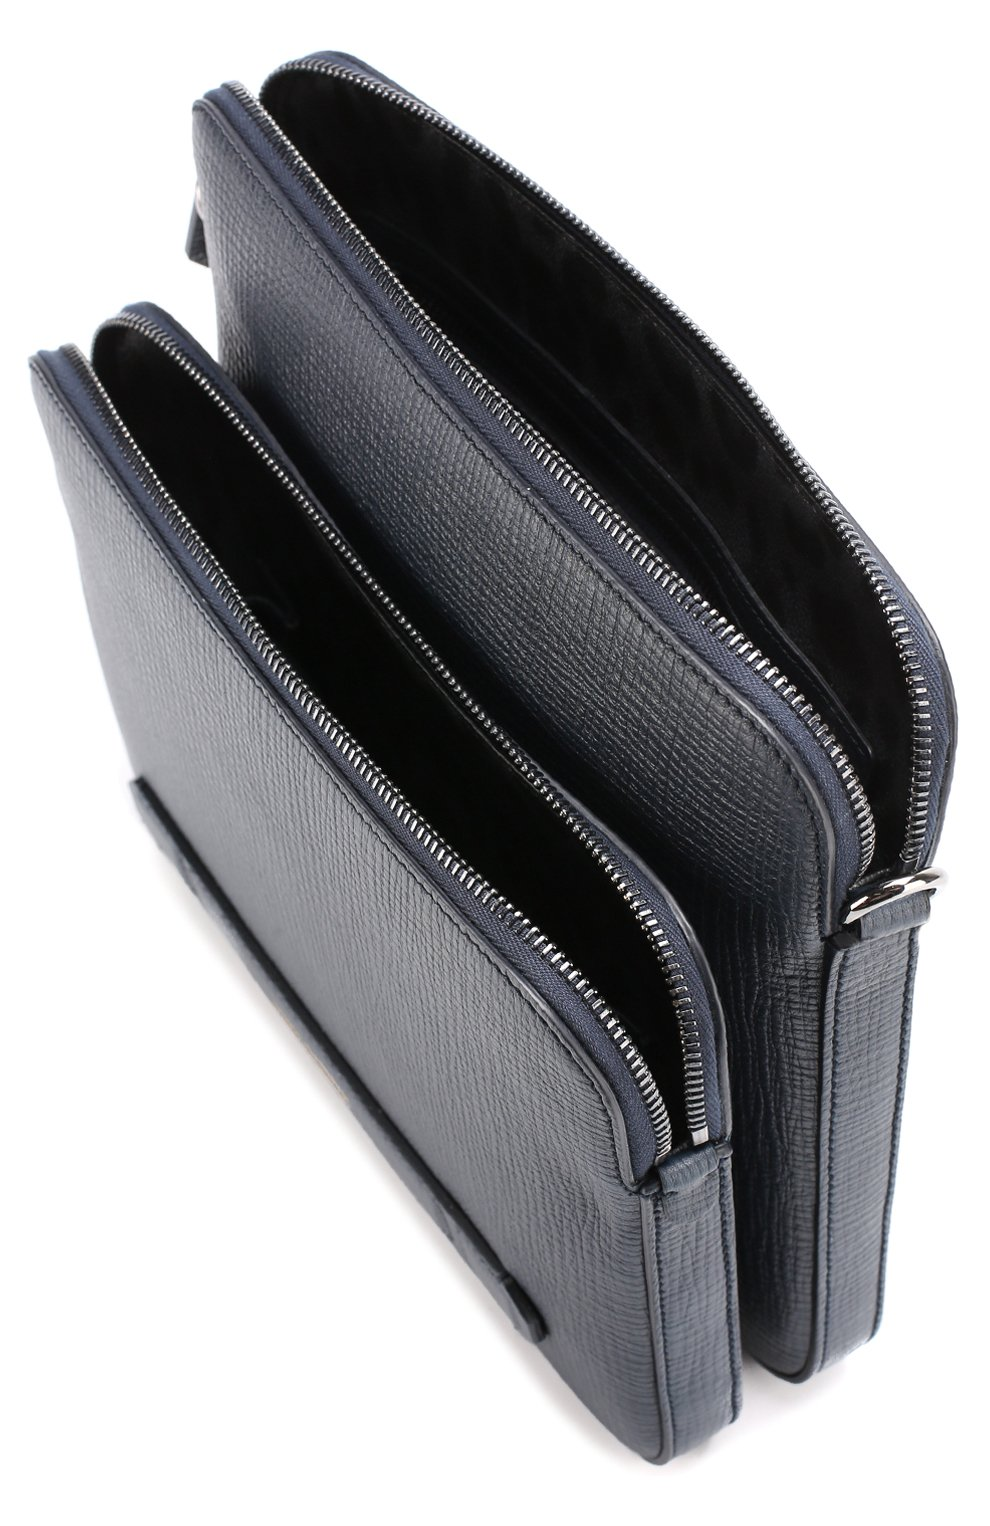 Кожаная сумка-планшет Mediterraneo с двумя отделениями на молнии Dolce & Gabbana темно-синяя | Фото №4